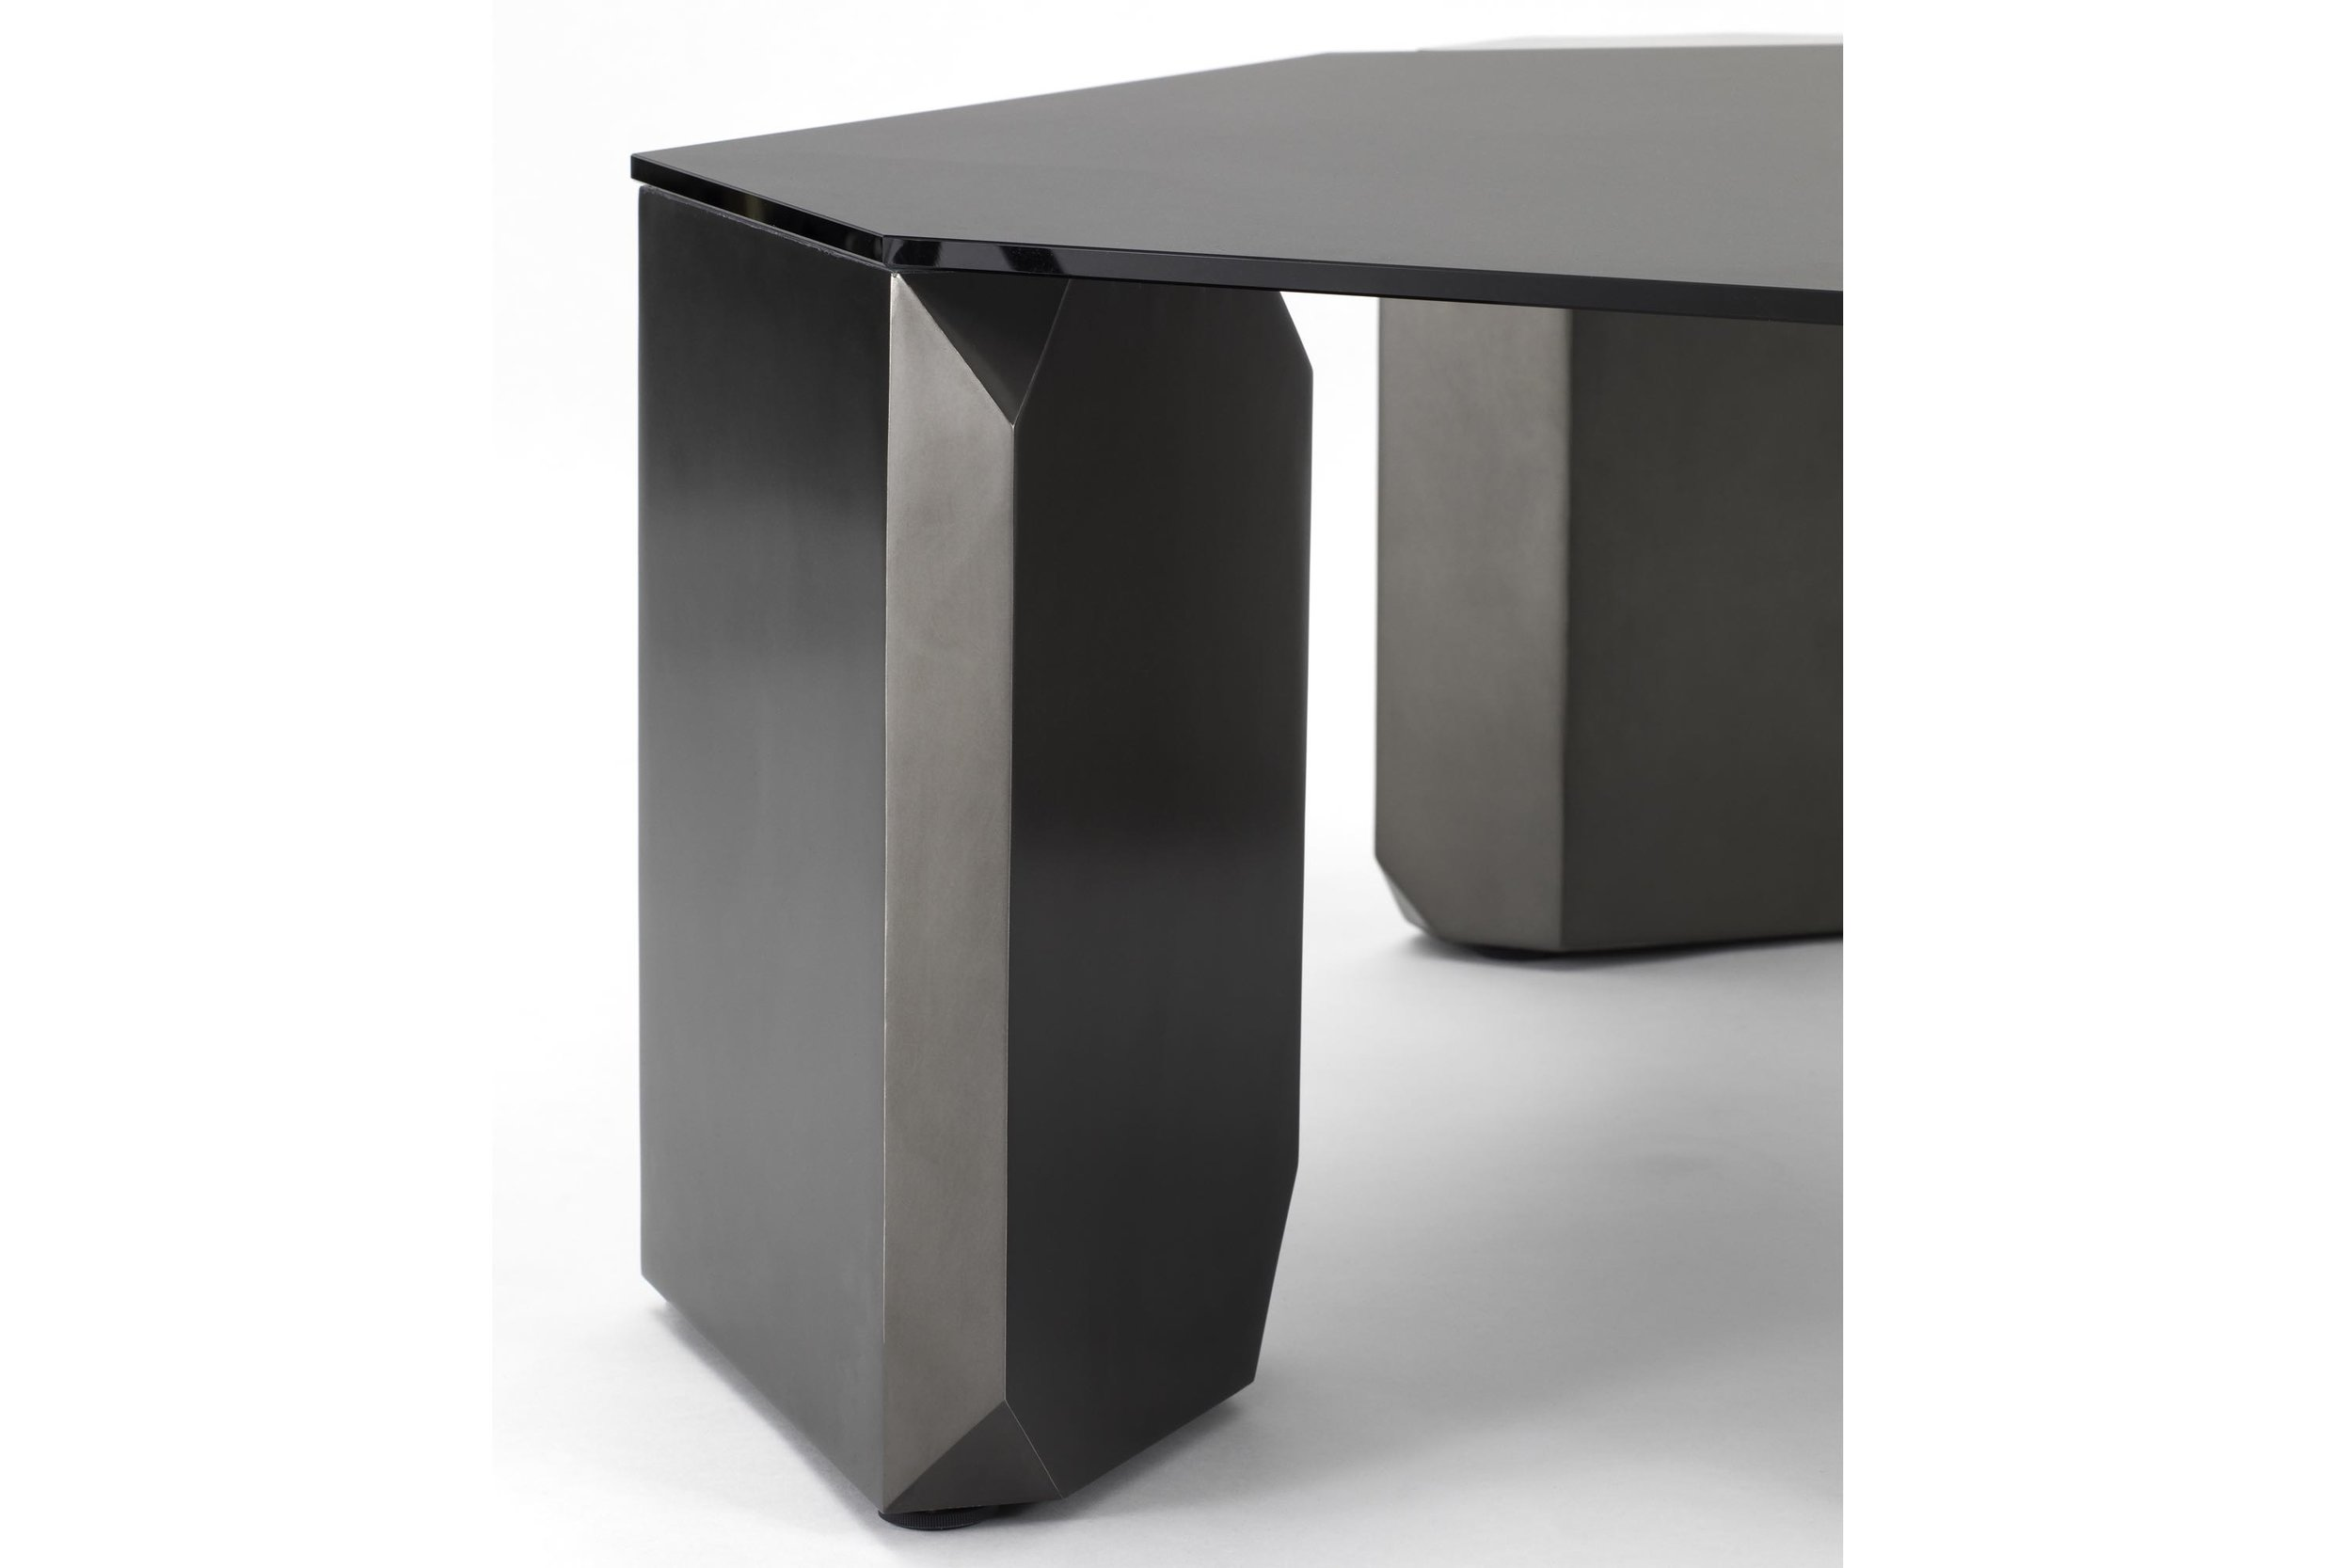 Avram_Rusu_Stonehenge_Coffee_Table_2.jpeg